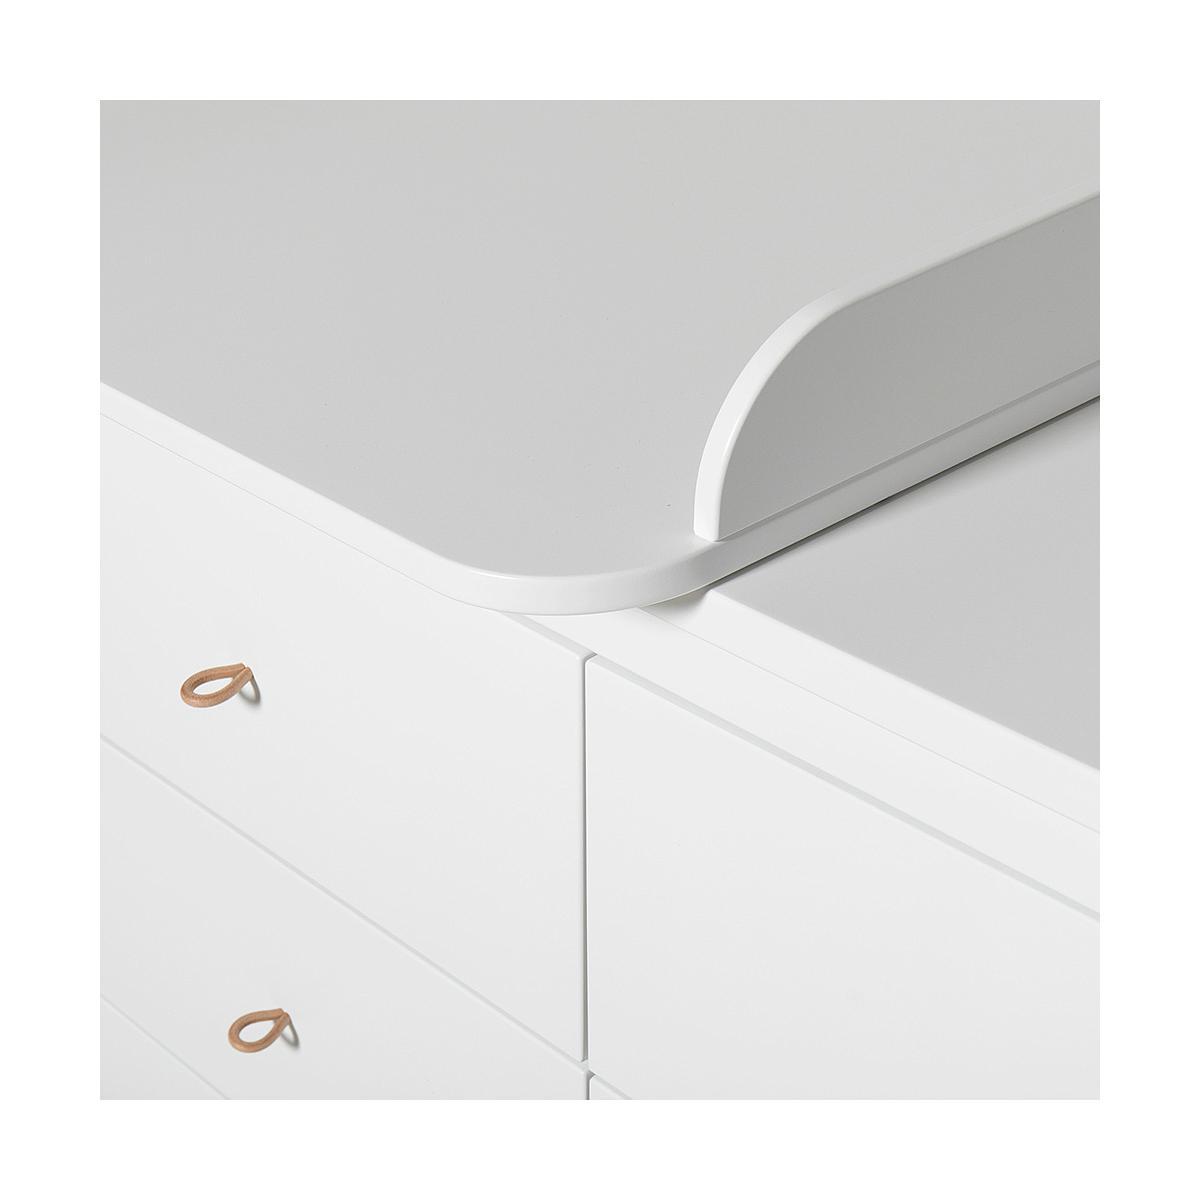 Commode 6 tiroirs plan à langer small WOOD Oliver Furniture blanc-chêne